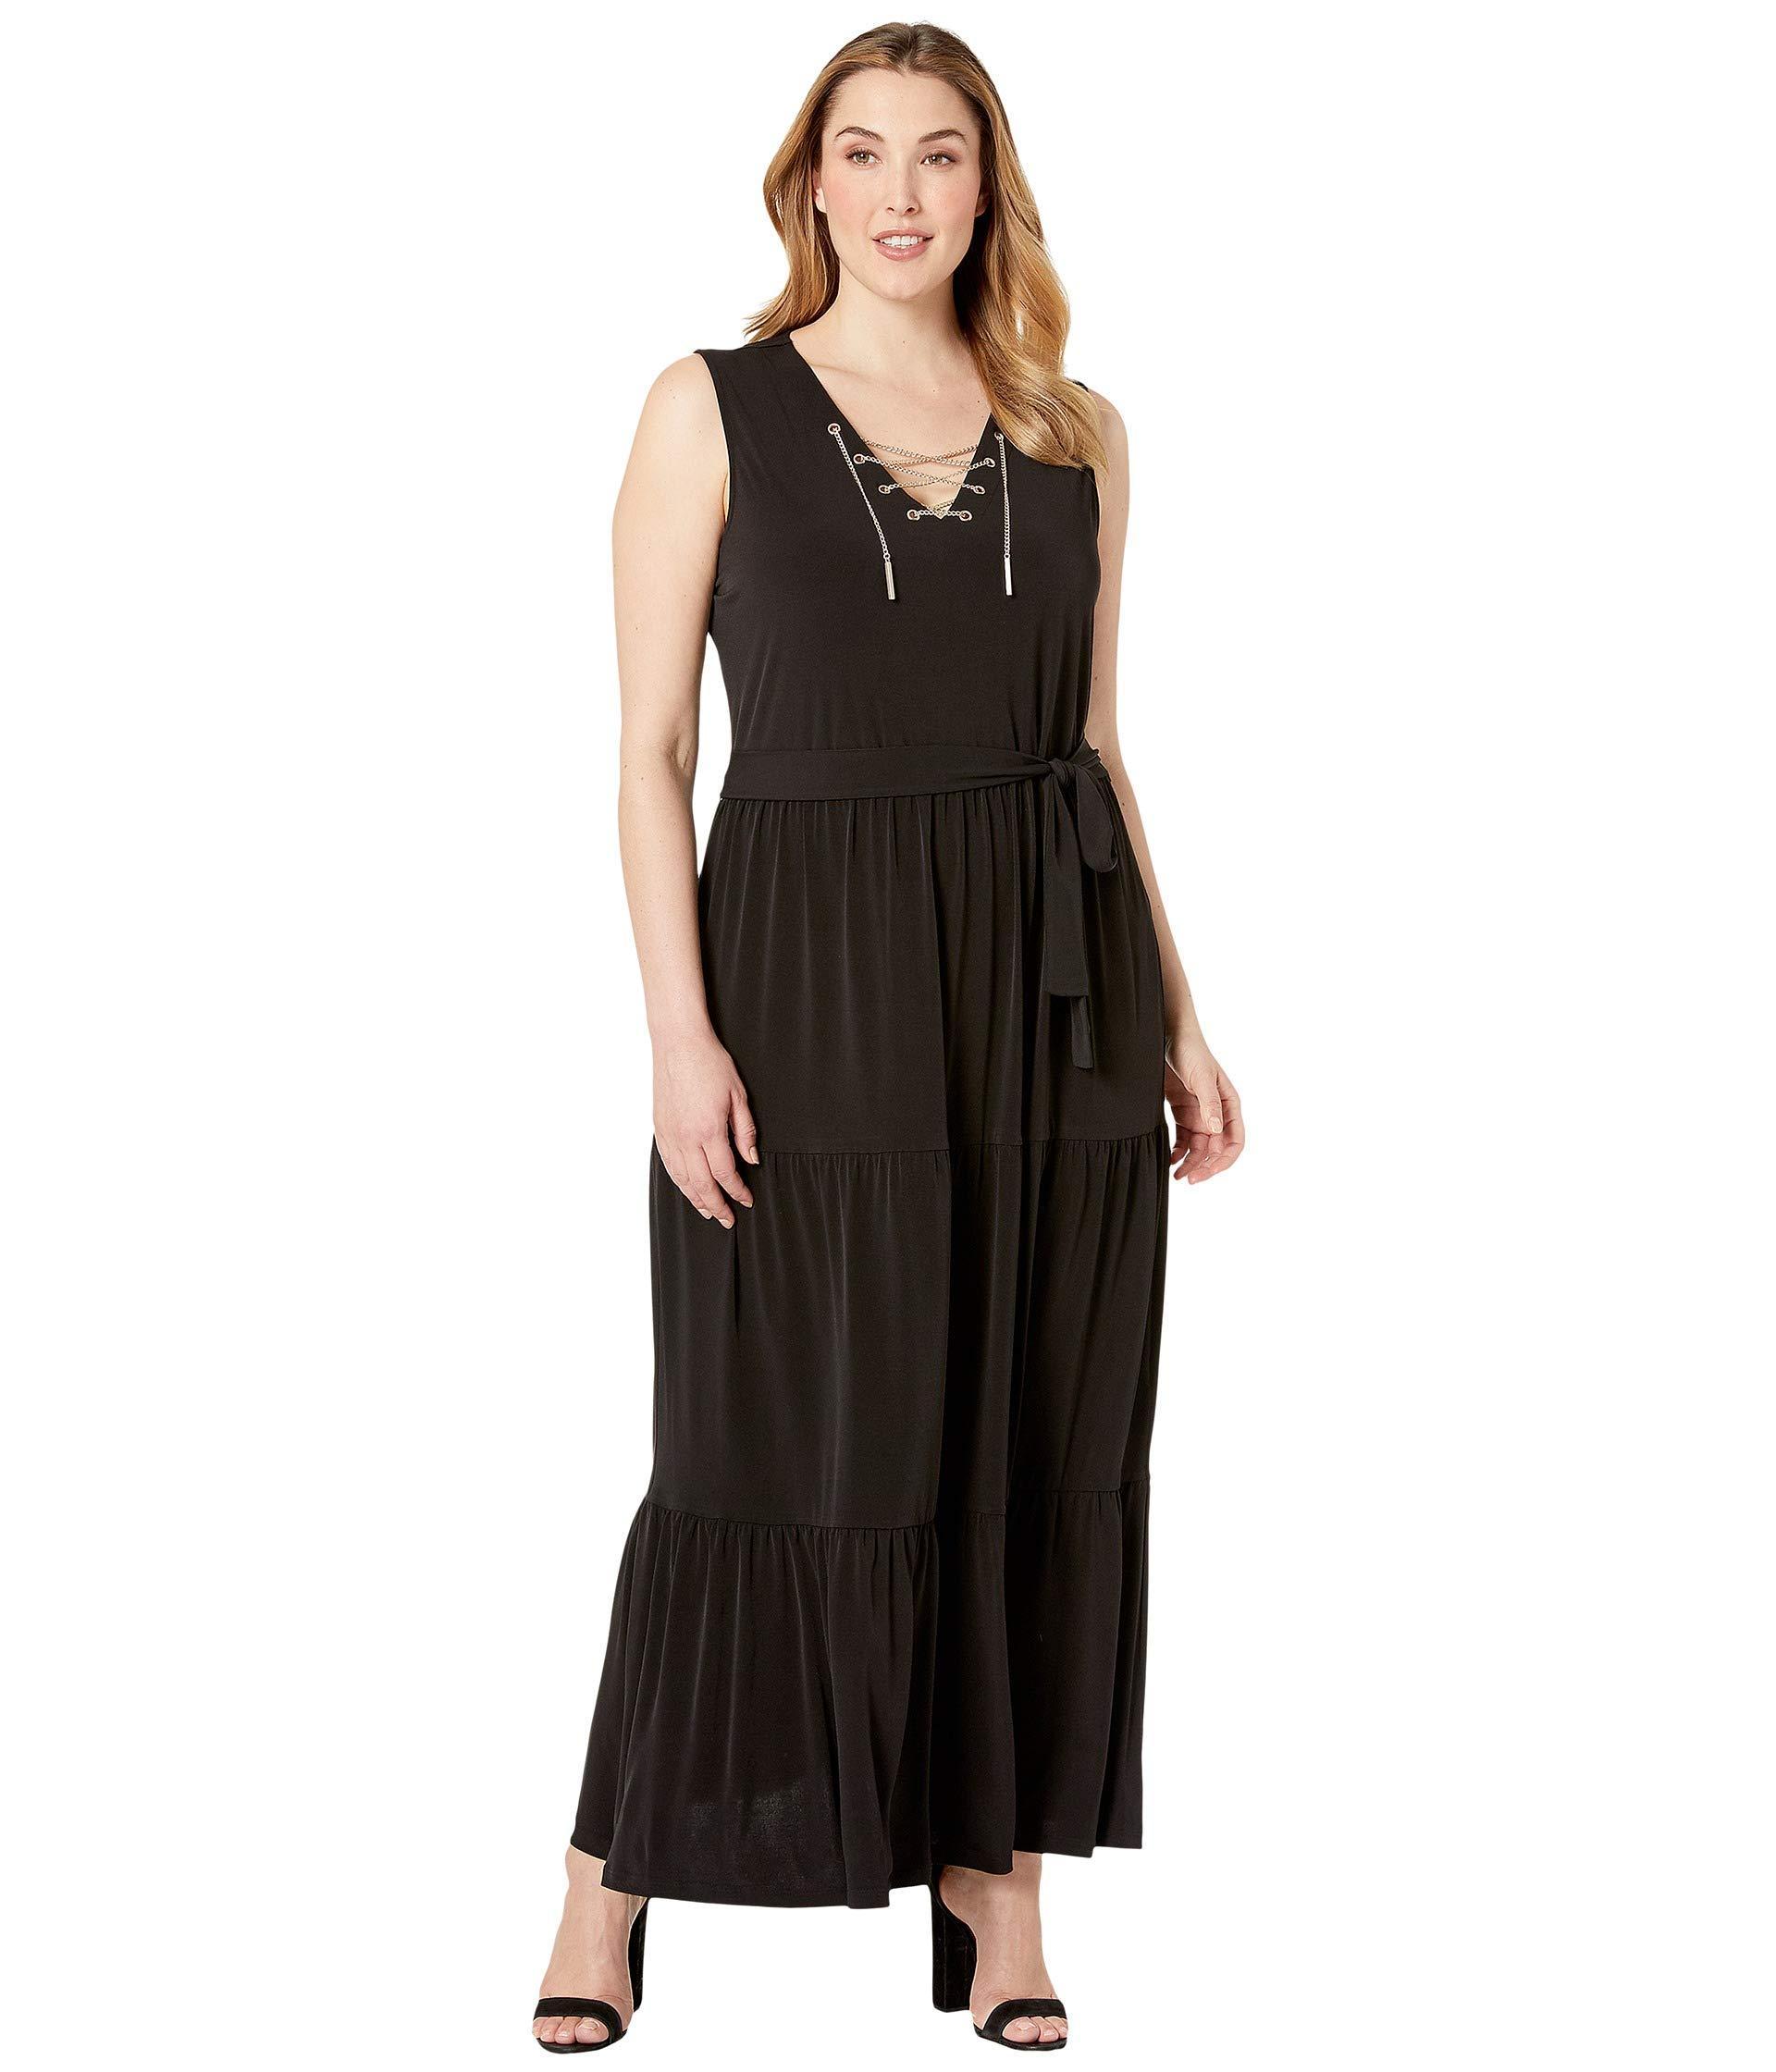 8e2211dc6c0 Navy Lace Maxi Dress Plus Size | Saddha